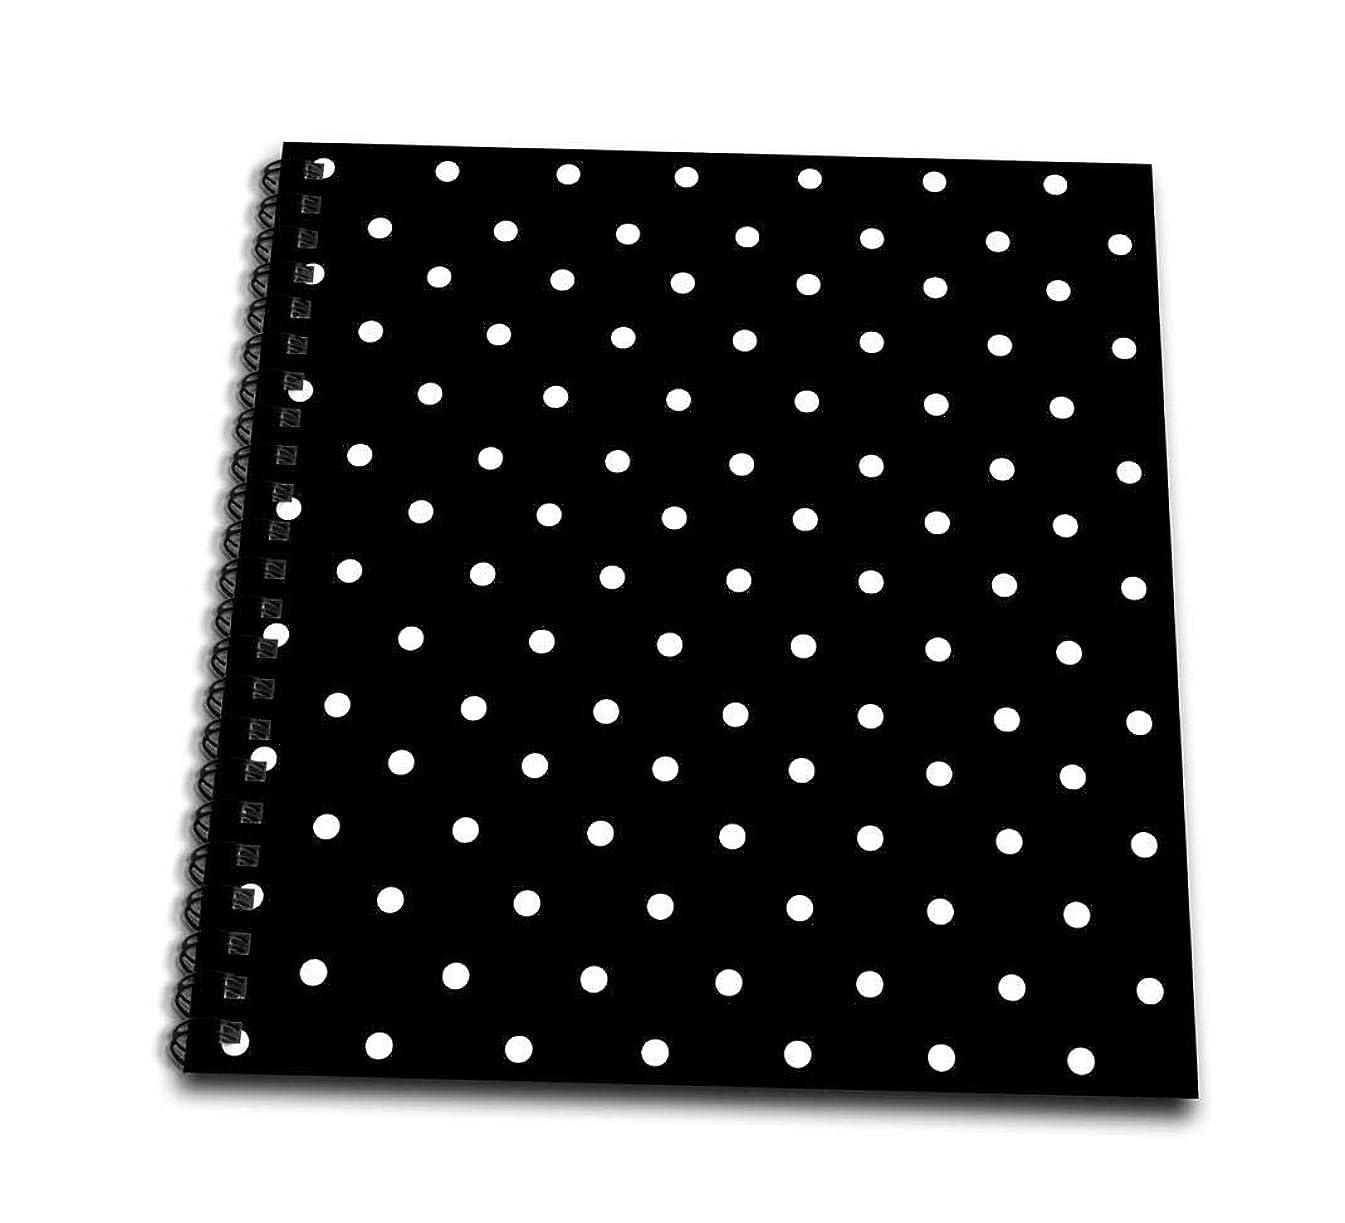 3dRose Black and White Polka Dot Pattern-Small Dots-Stylish Classic-Classy Elegant Retro Dotty Spotty-Memory Book, 12 by 12